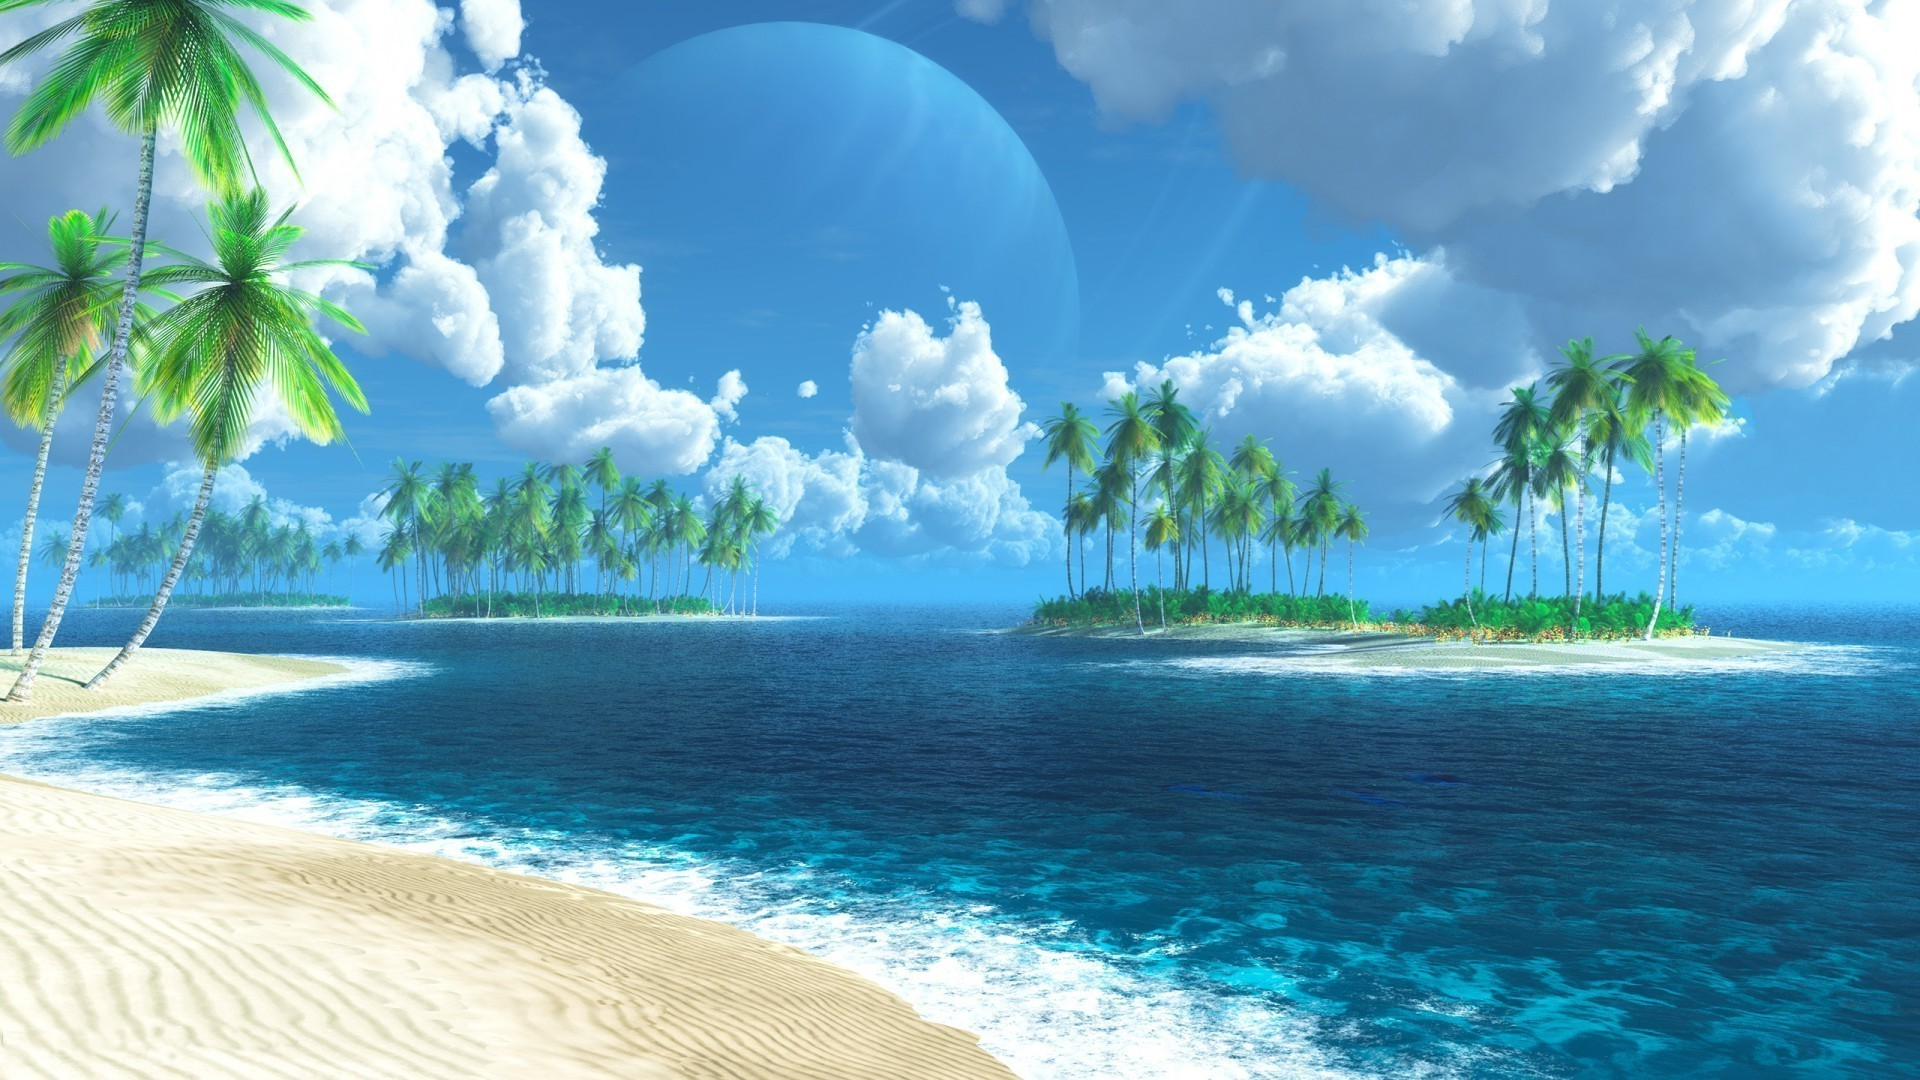 Island wallpaper image